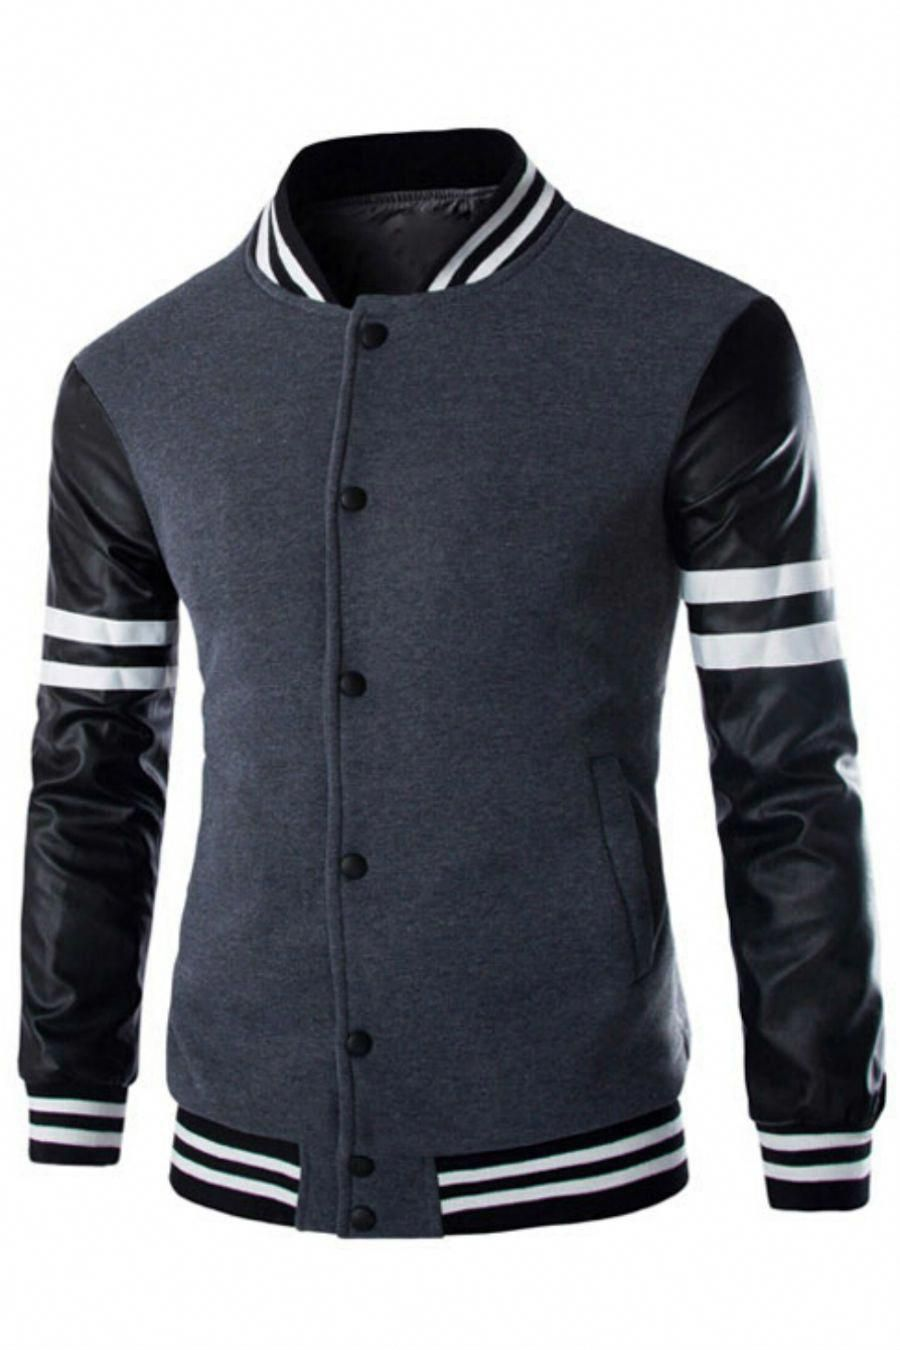 Gray Leather Long Sleeve Splicing Bomber Jacket Leatherjacketsformengrey Big Men Fashion Mens Fashion Edgy Mens Fashion Casual [ 1350 x 900 Pixel ]